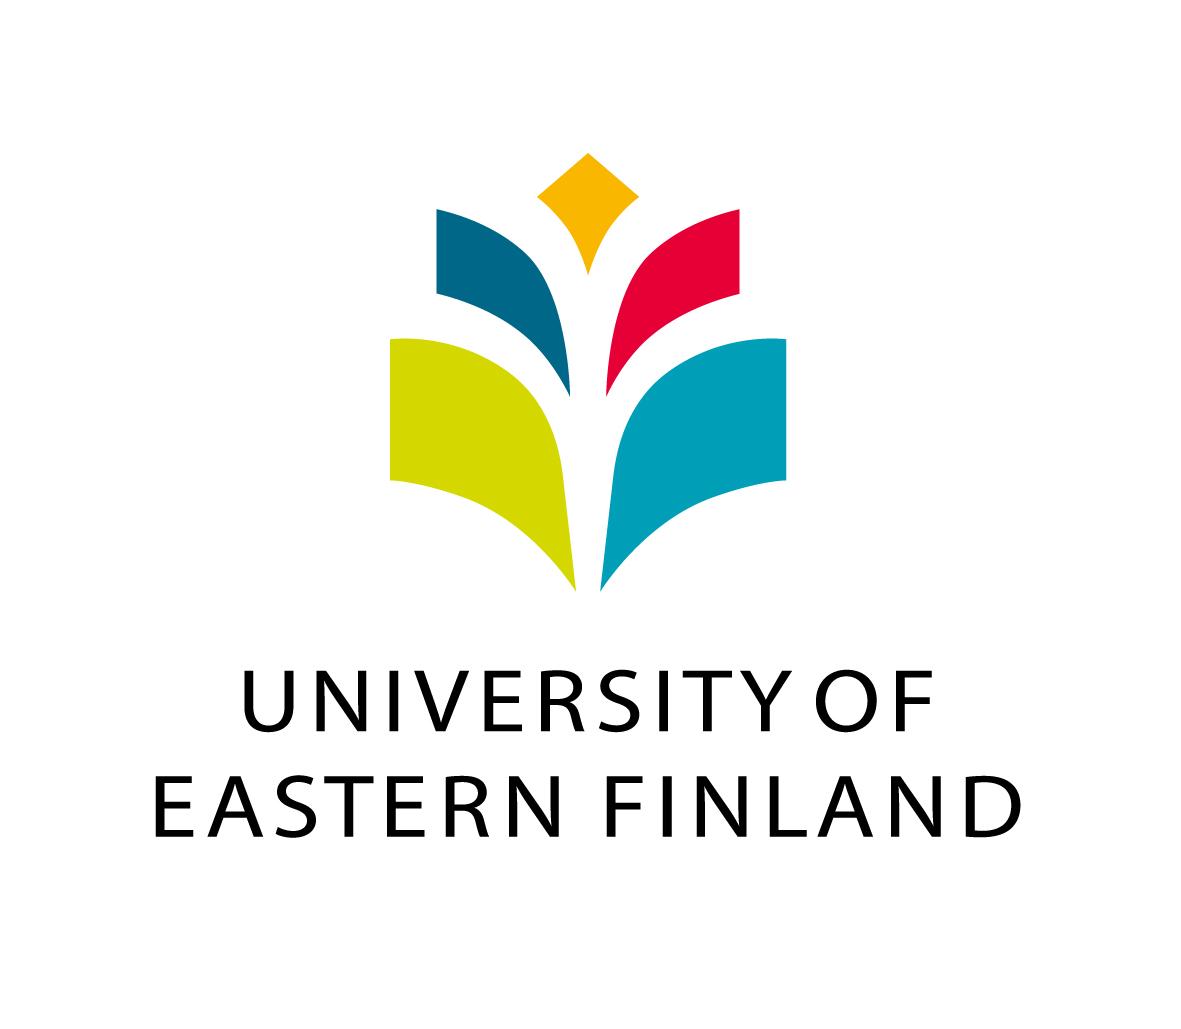 University of Eastern Finland logo